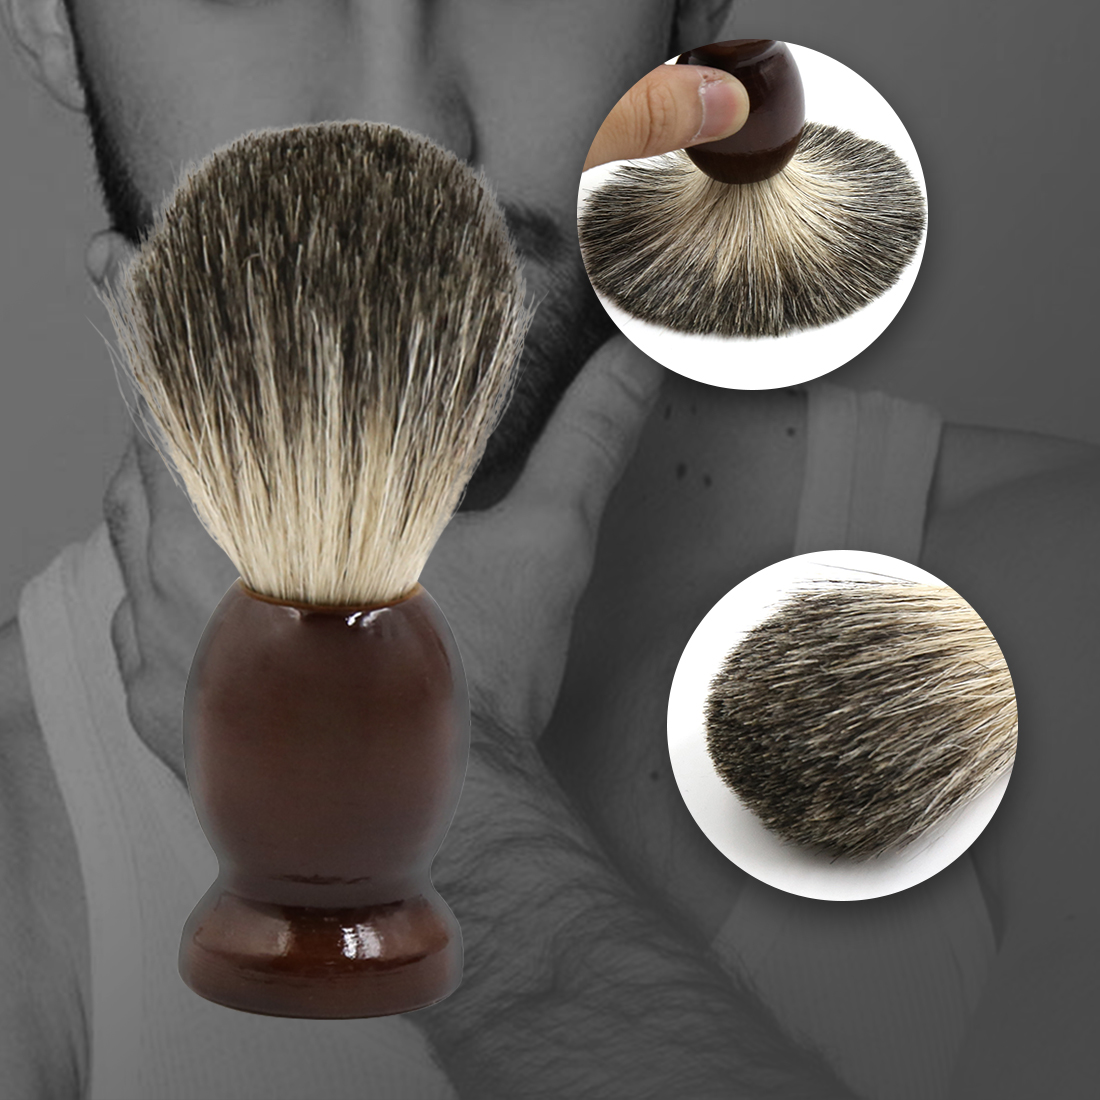 Brown Wooden Handle Pure Badger Hair Wet Shaving Brush for Men's Grooming